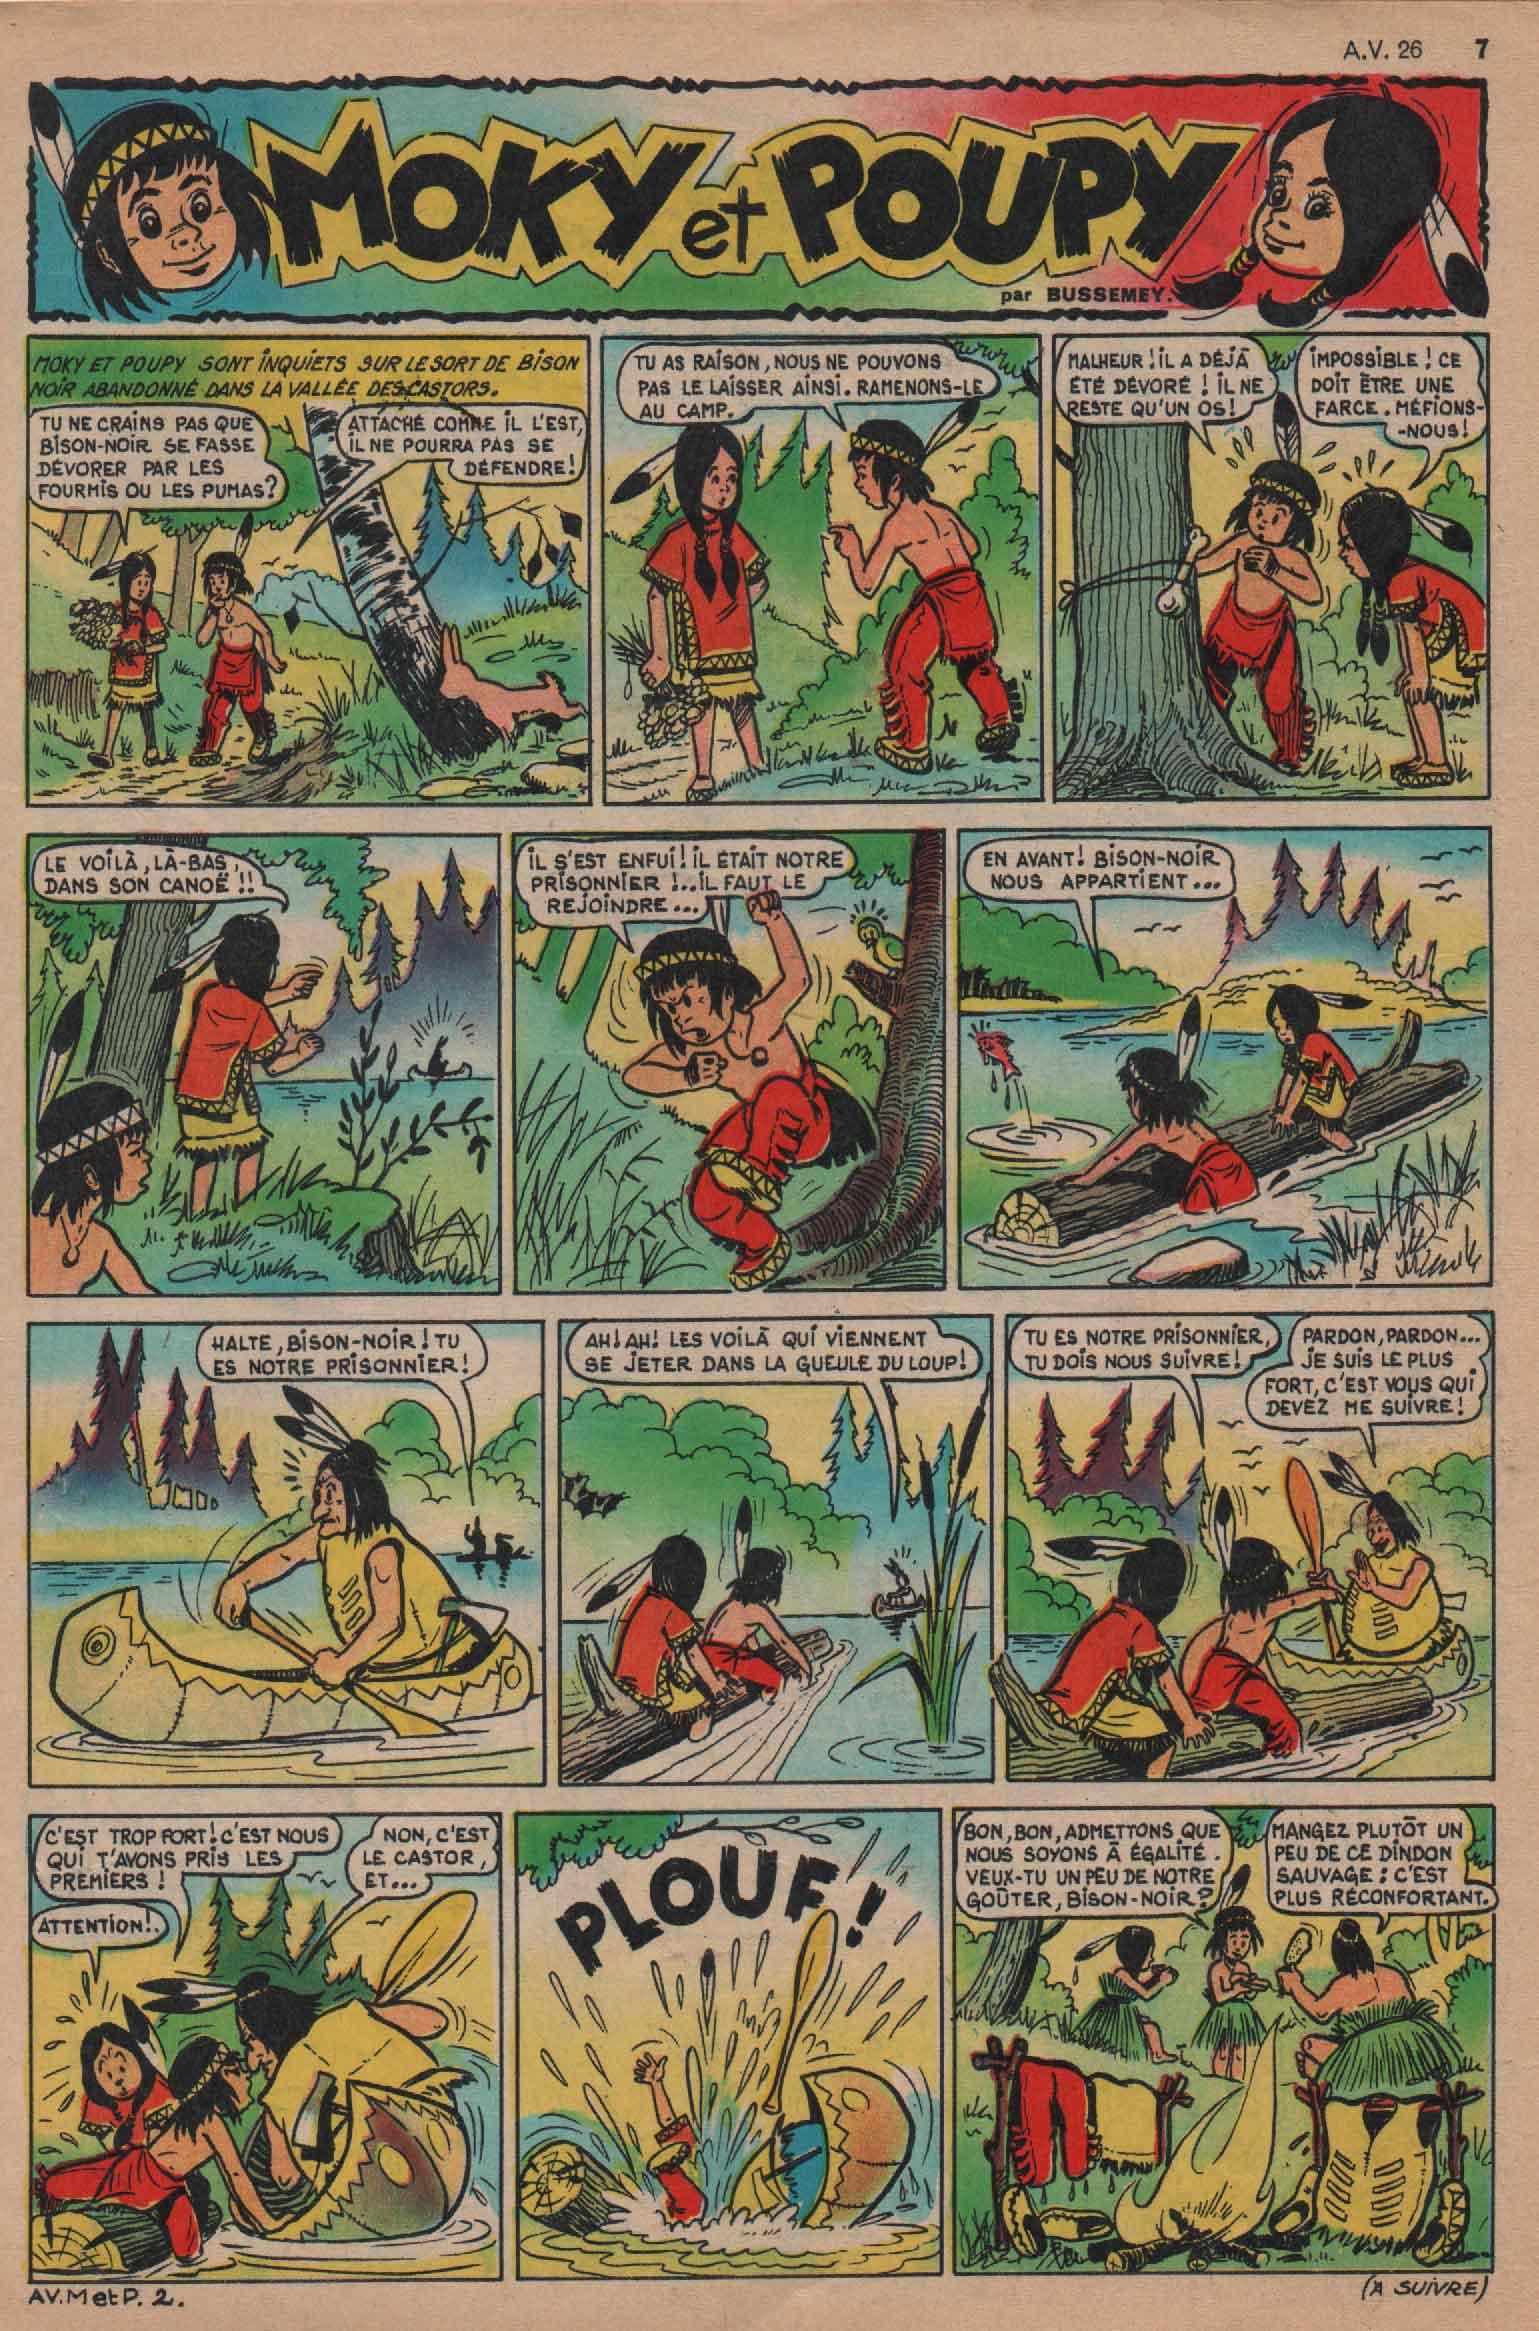 « Moky et Poupy » Âmes vaillantes n° 26 (29/06/1958).